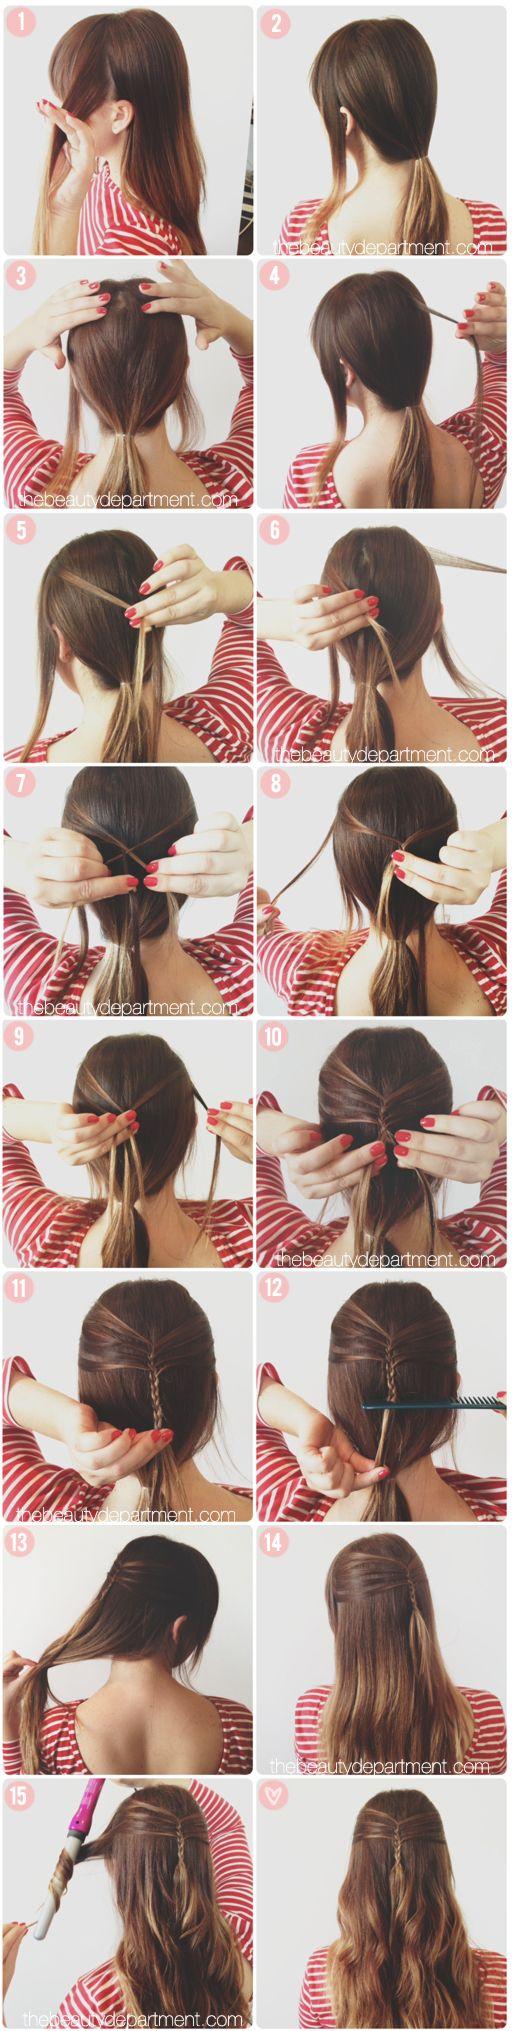 mini braid